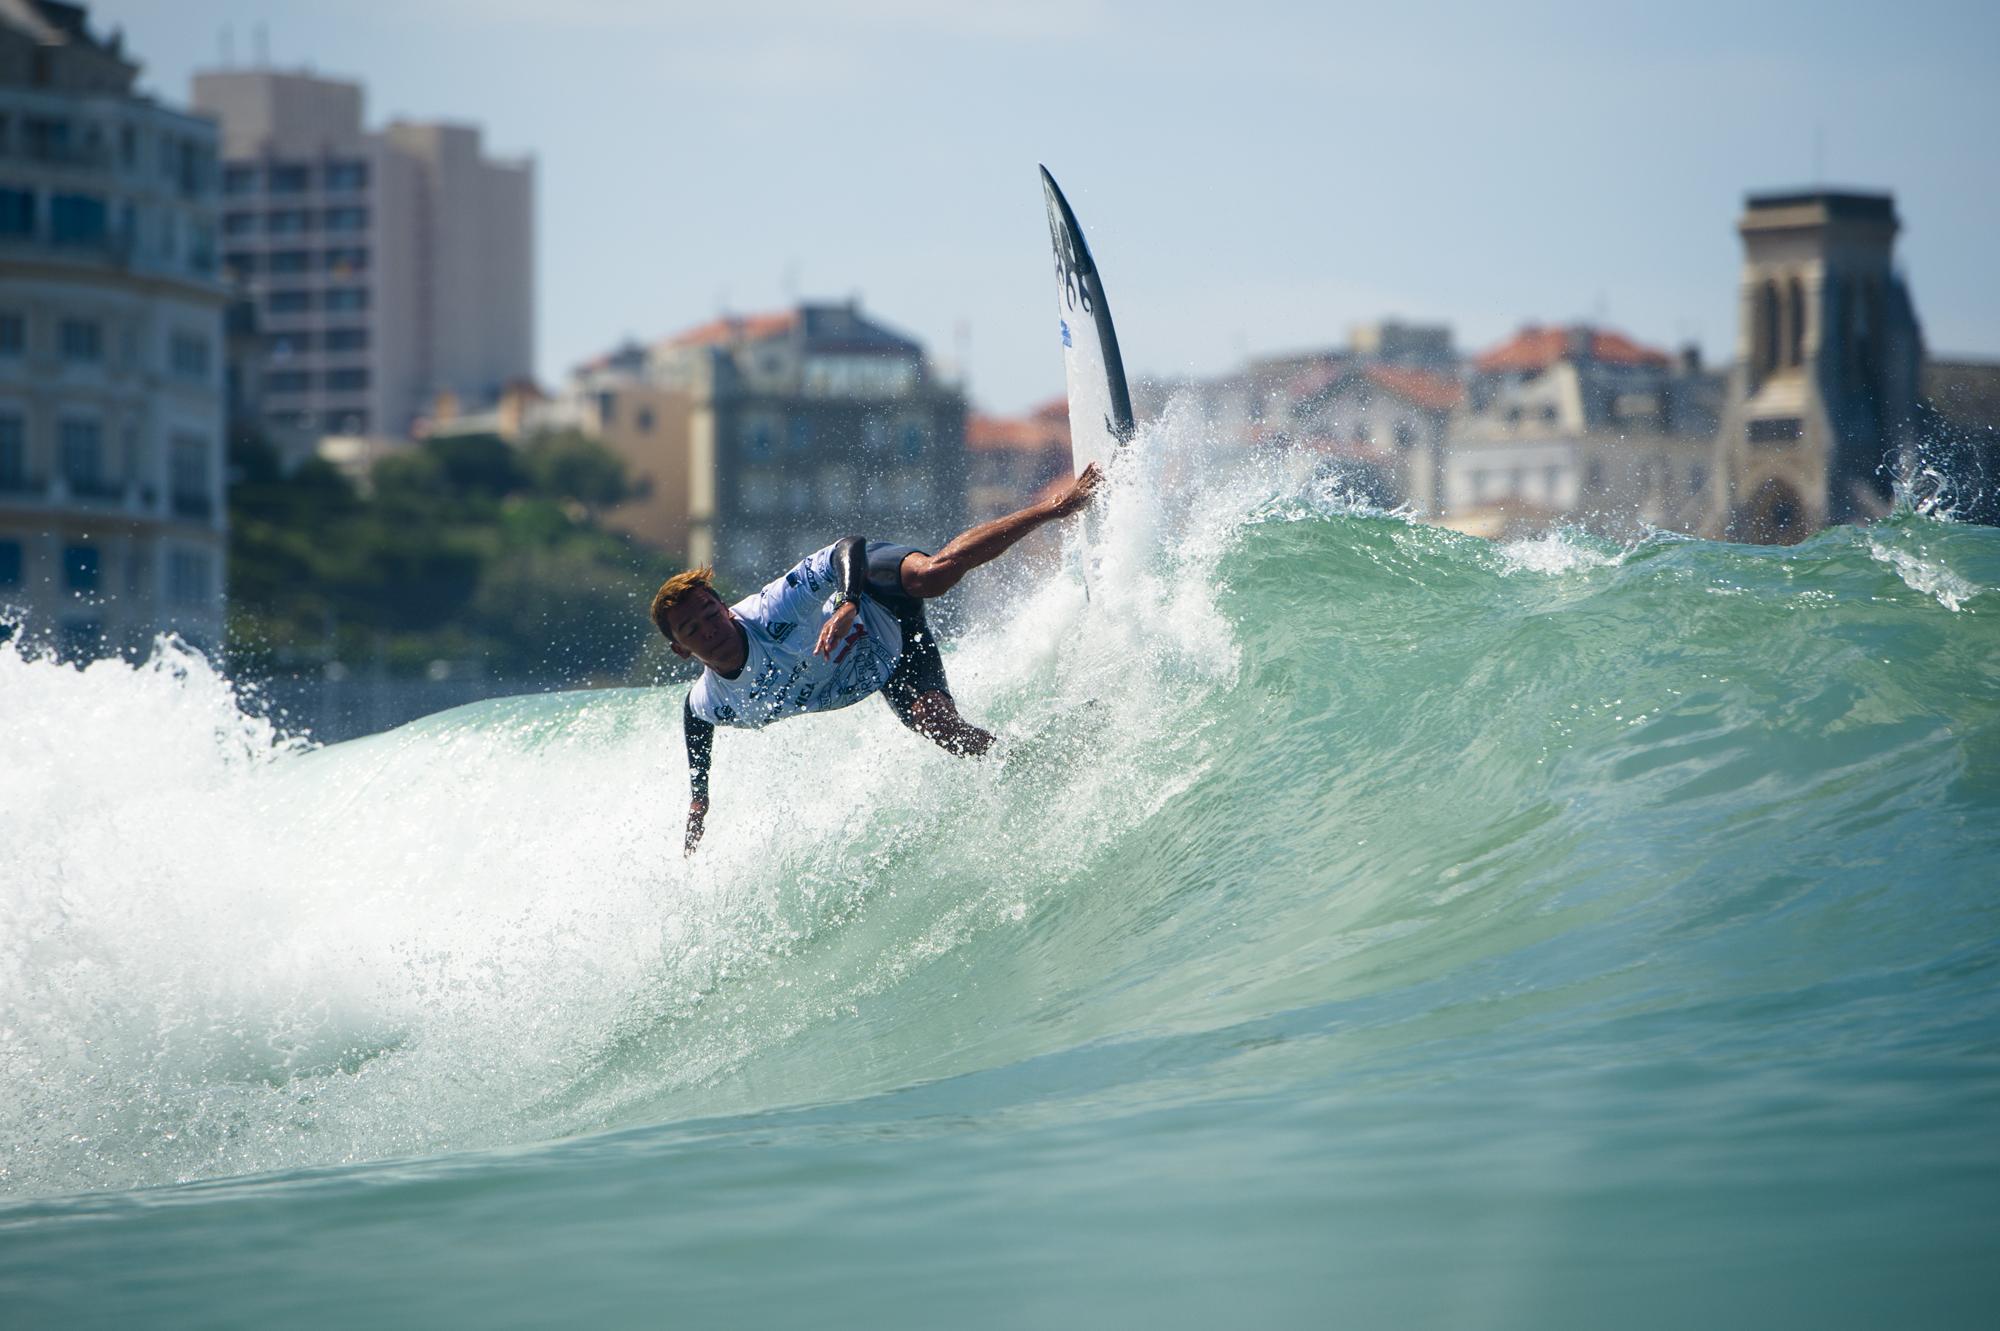 leonardo-calvo-costa-rica-ISA-world-surfing-games-2017-biarritz-antoine-justes-we-creative